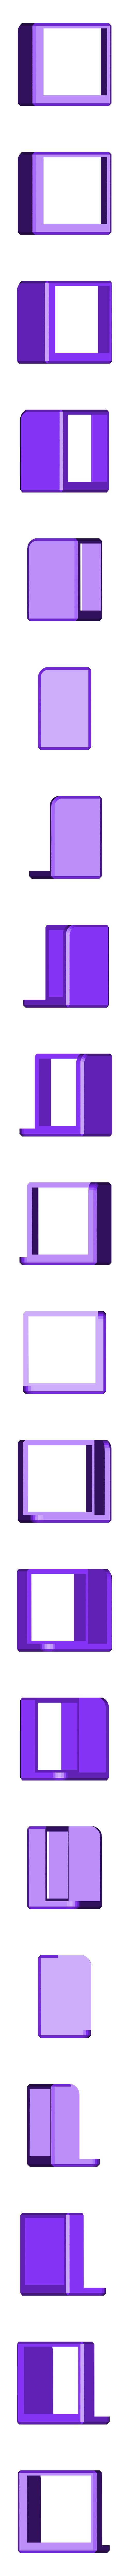 Uchwyt_B.stl Download free STL file Ikea Lack connecting/stacking handles • 3D printer template, kpawel